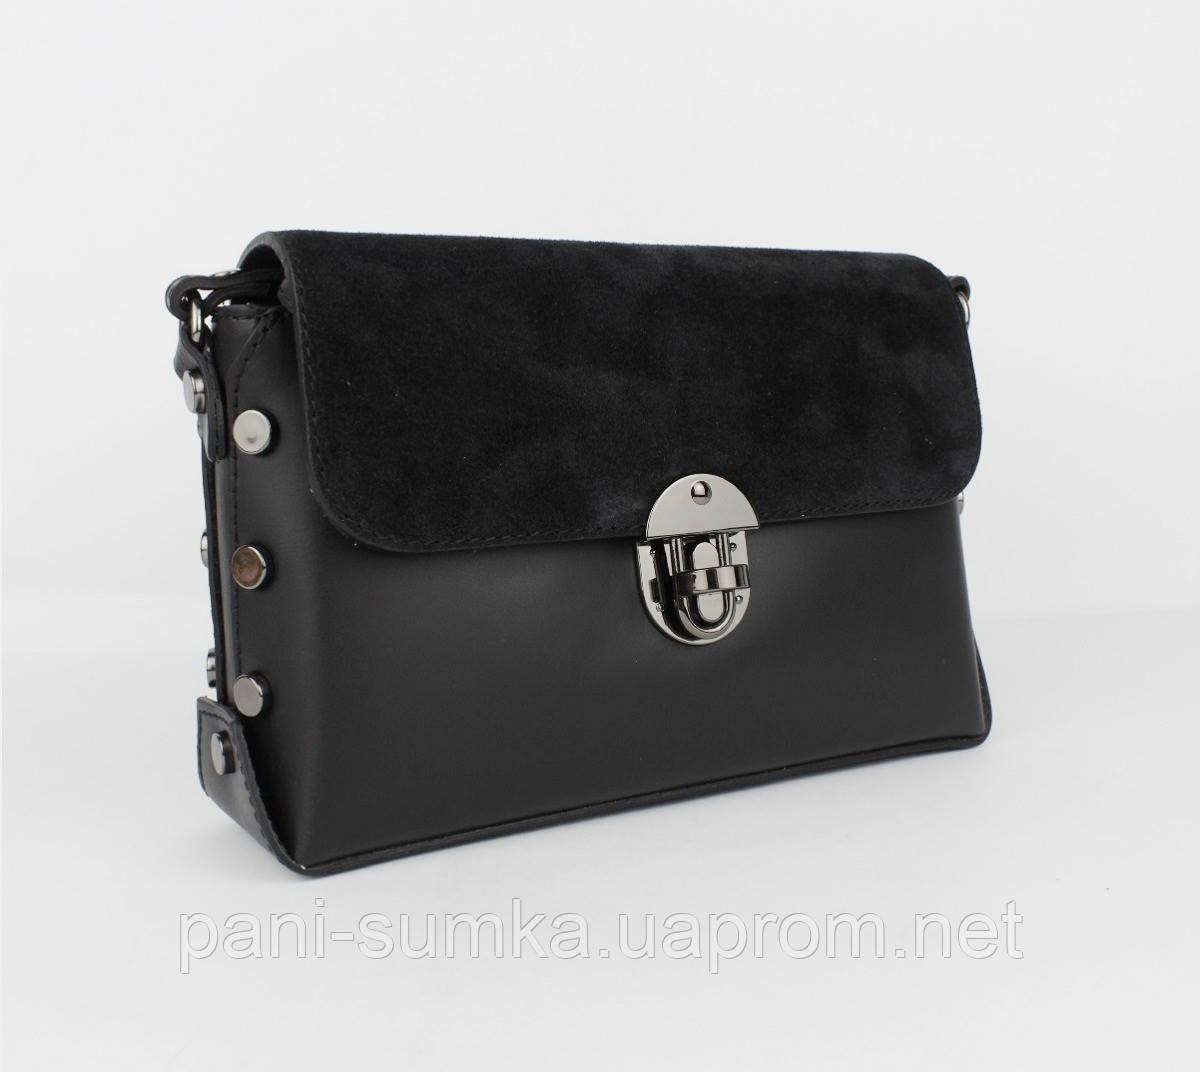 ec6064fa2d87 Кожаная сумочка с замшевым клапаном Borse in pelle 323908-1 черная, Италия,  фото